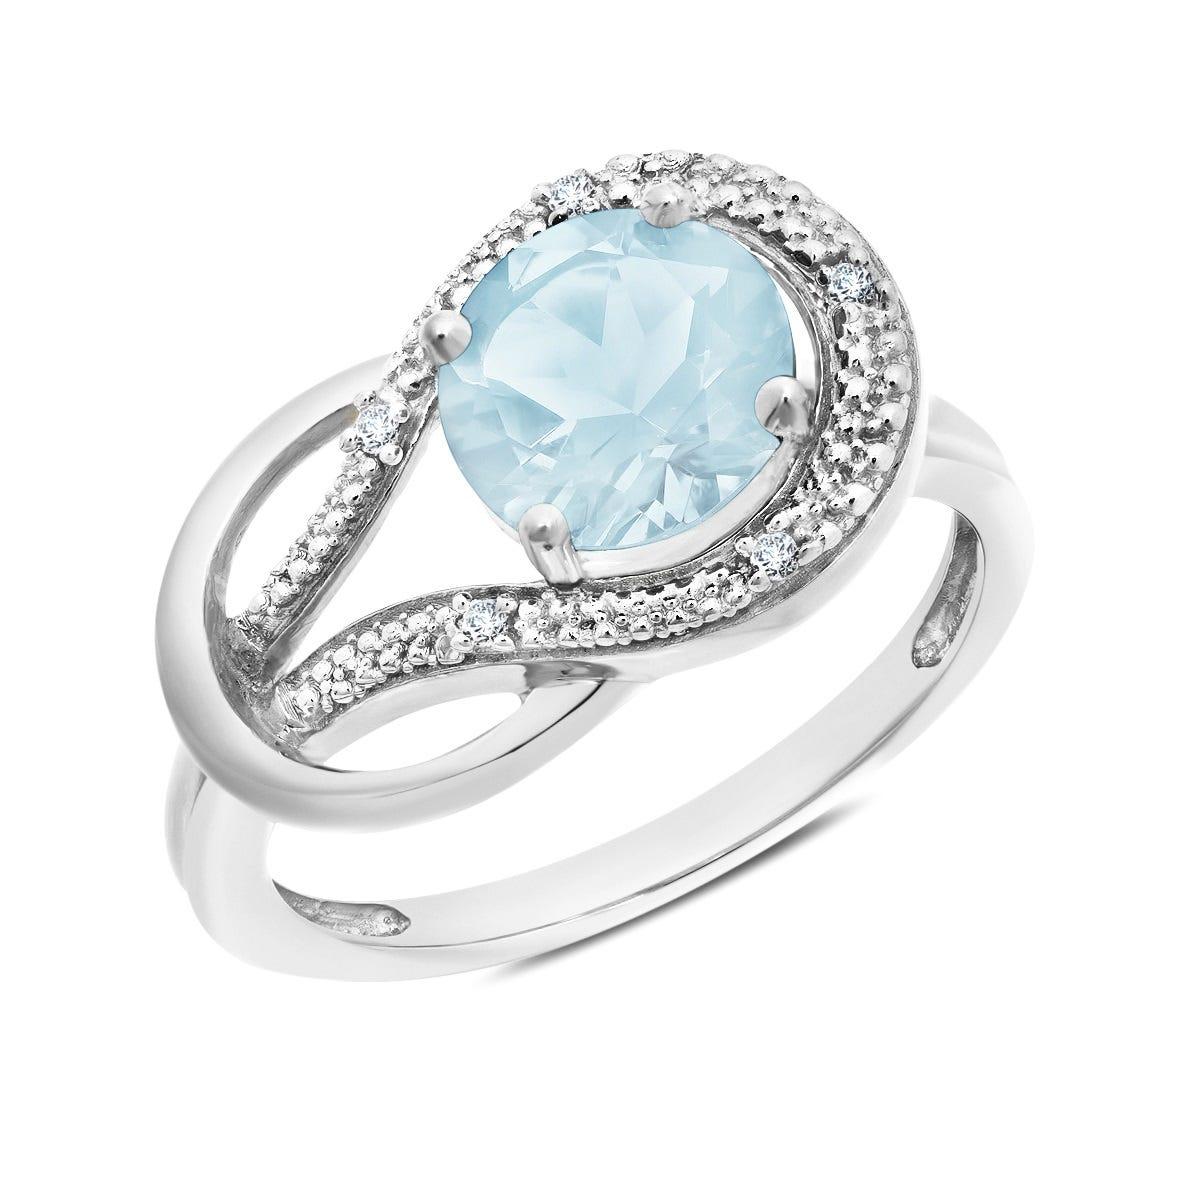 Aquamarine & Diamond Love Knot Ring in 10k White Gold